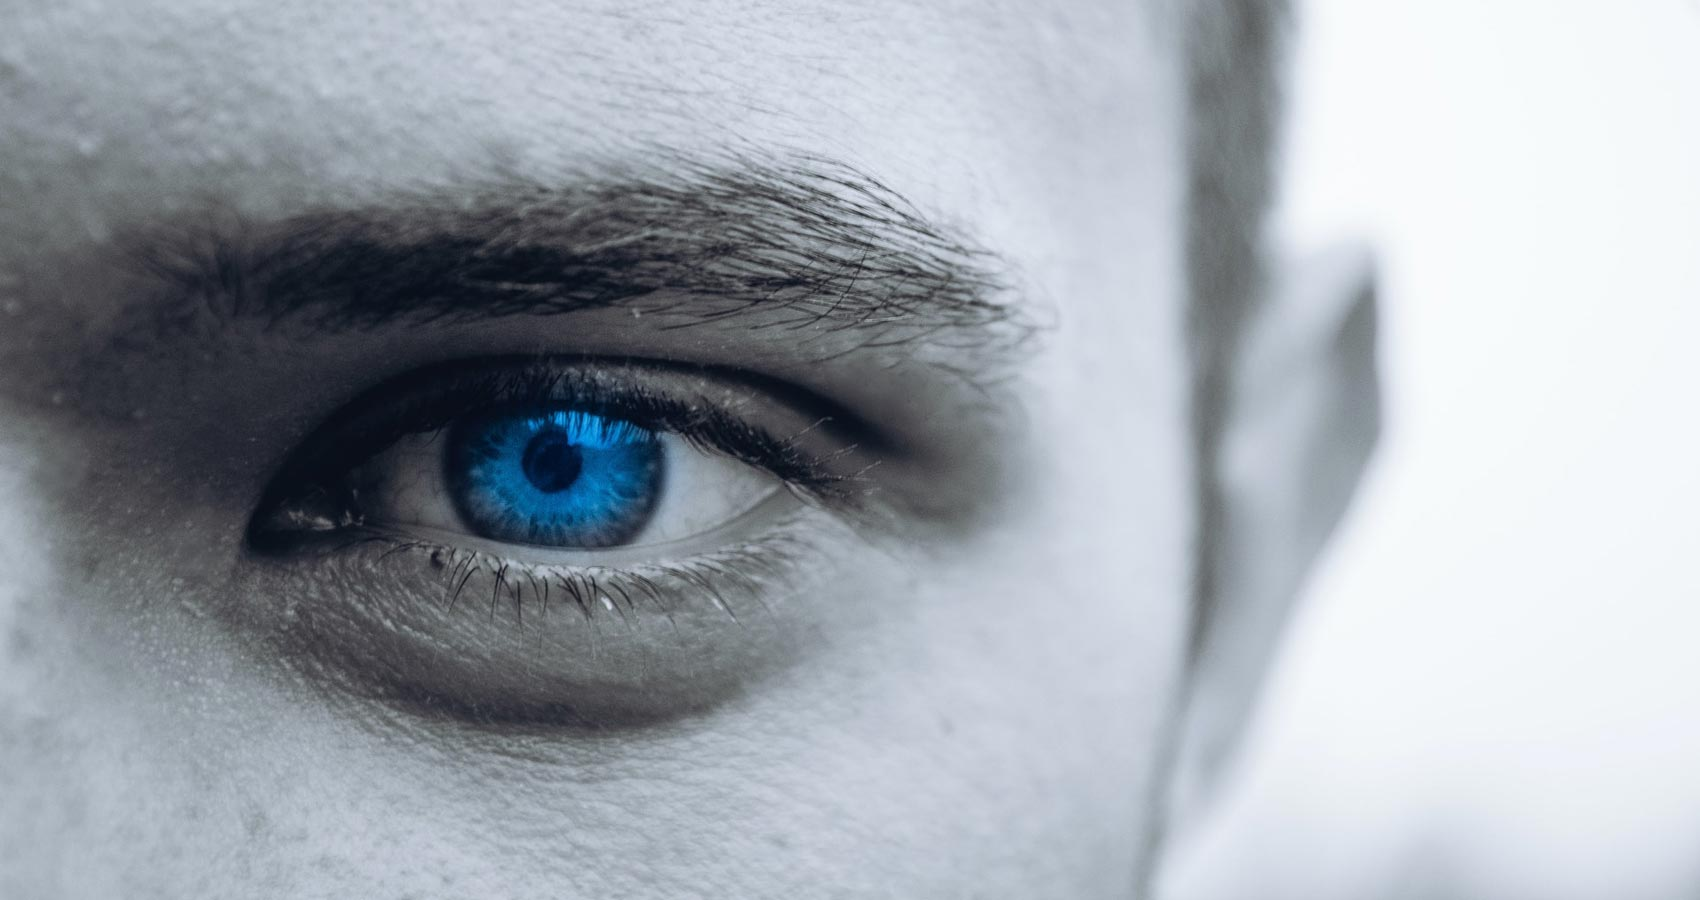 Black Puma Eyes, poetry by DJ Elton at Spillwords.com